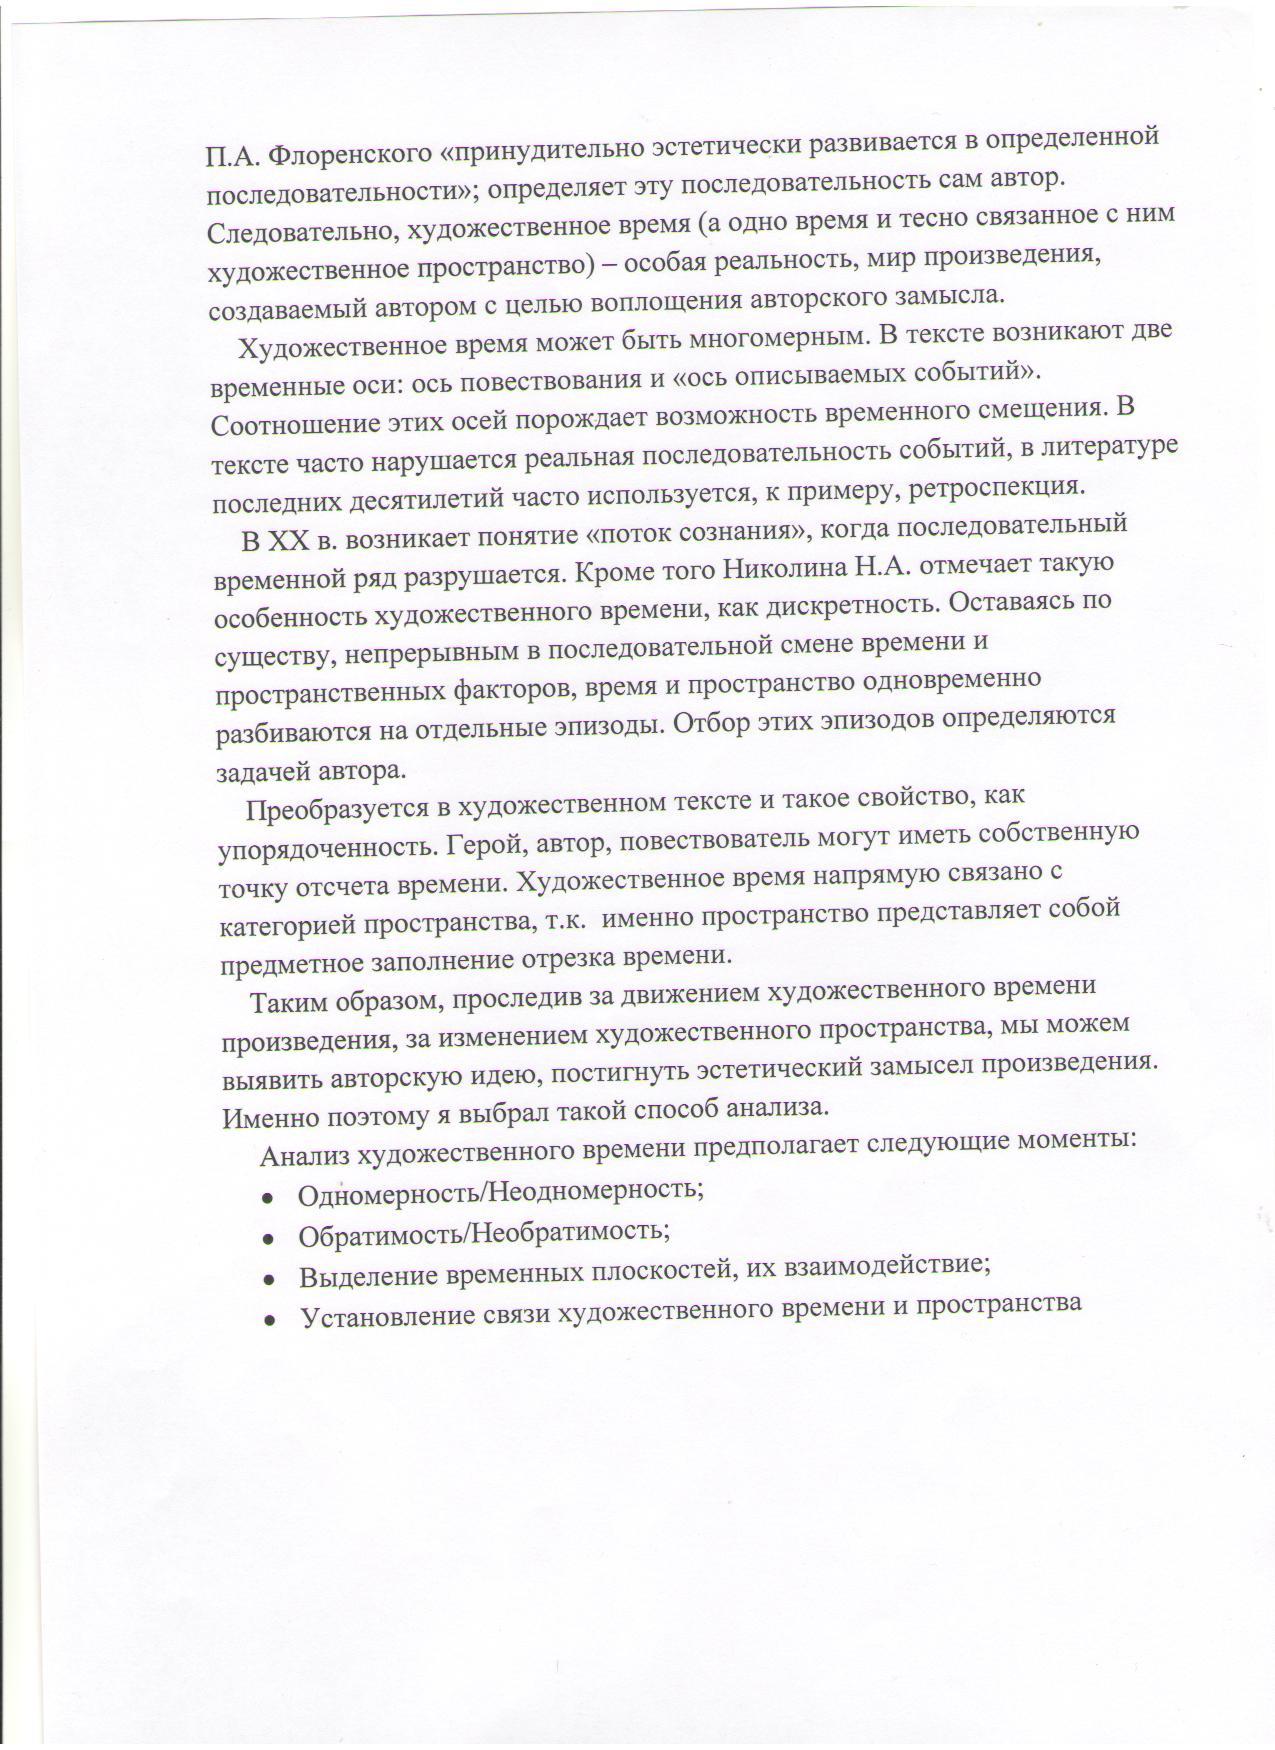 C:\Documents and Settings\Иван\Рабочий стол\gtlcjdtn\изображение 002.jpg